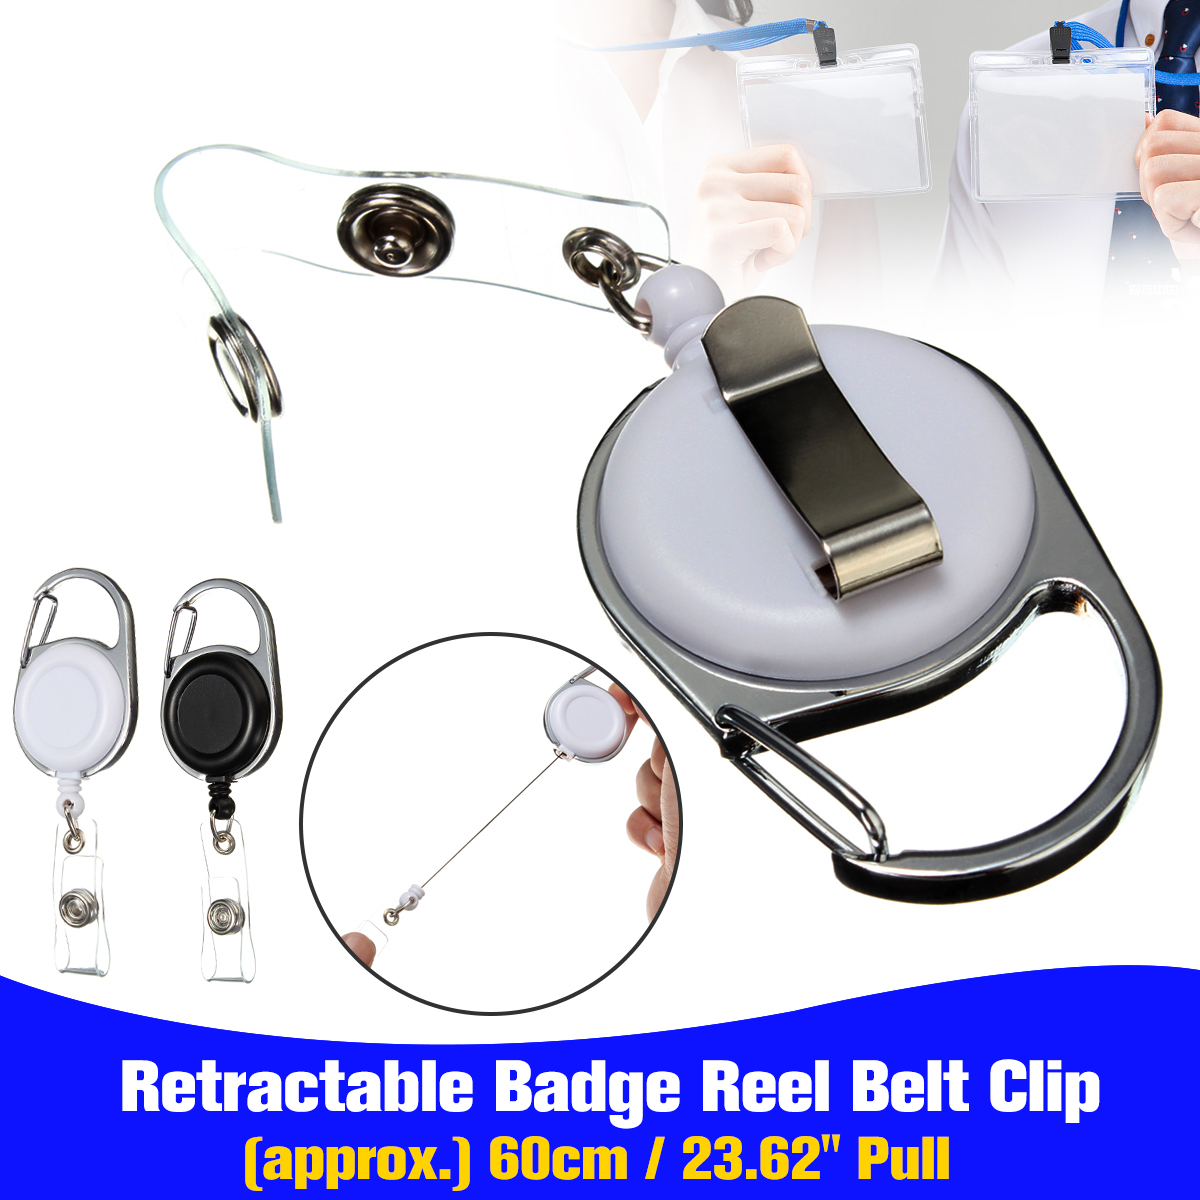 Kicute New Retractable Pull Key Ring ID Badge Lanyard Name Tag Card Holder Recoil Reel Belt Clip Metal Housing Plastic Covers